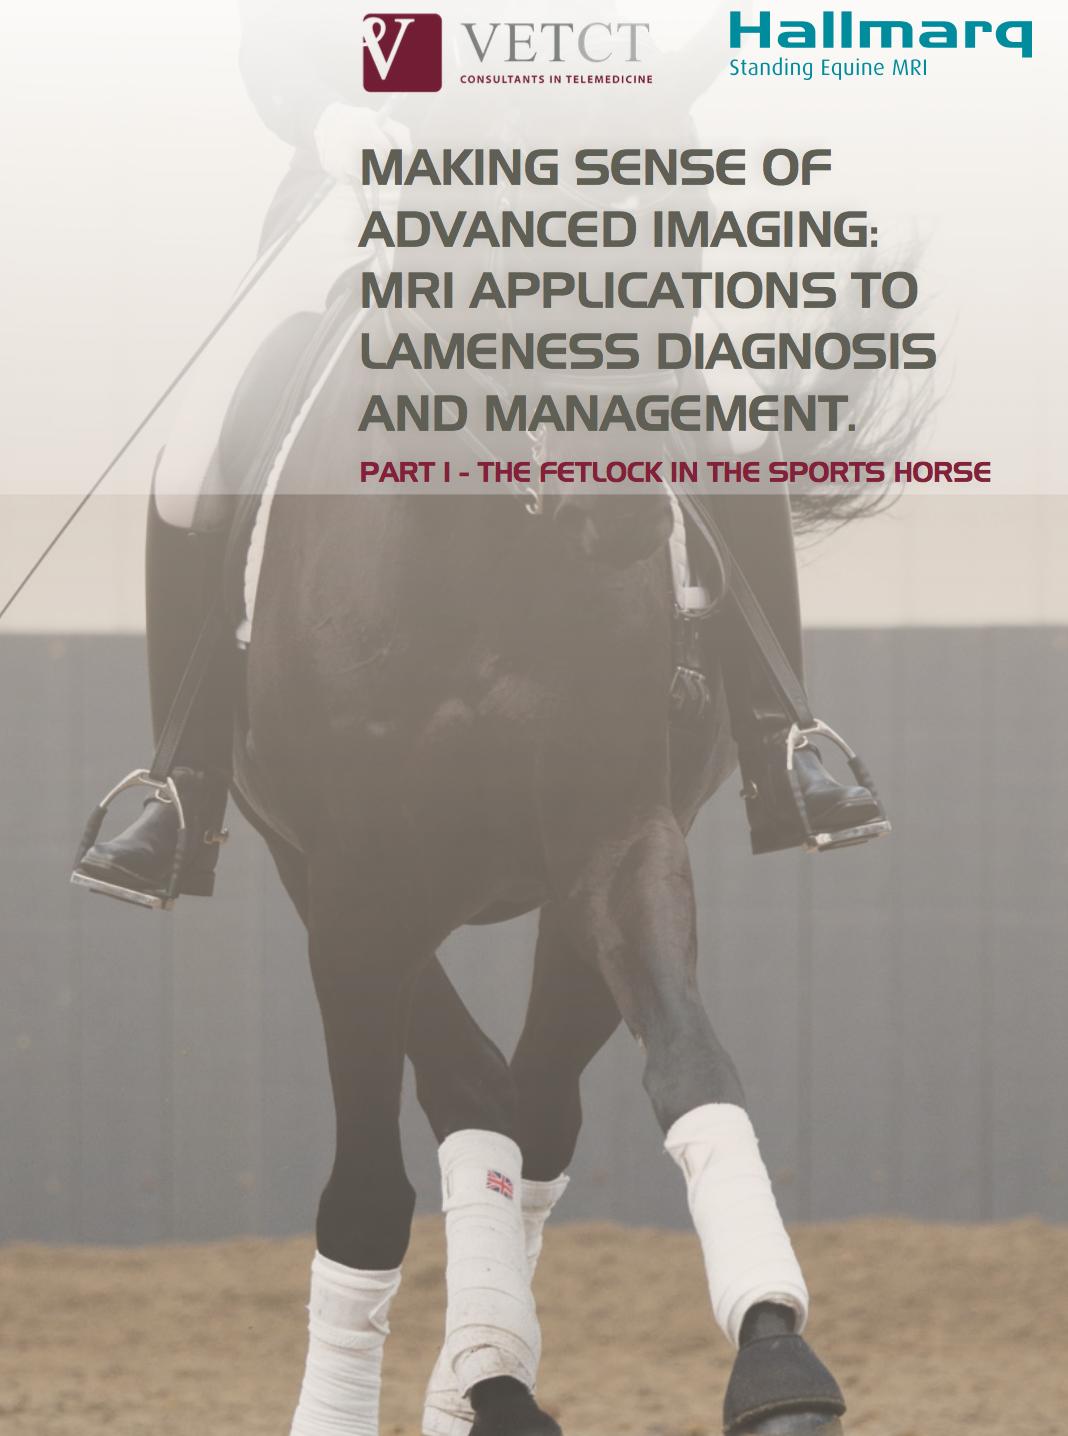 Courses, CPD – VetCT, Consultants in Telemedicine